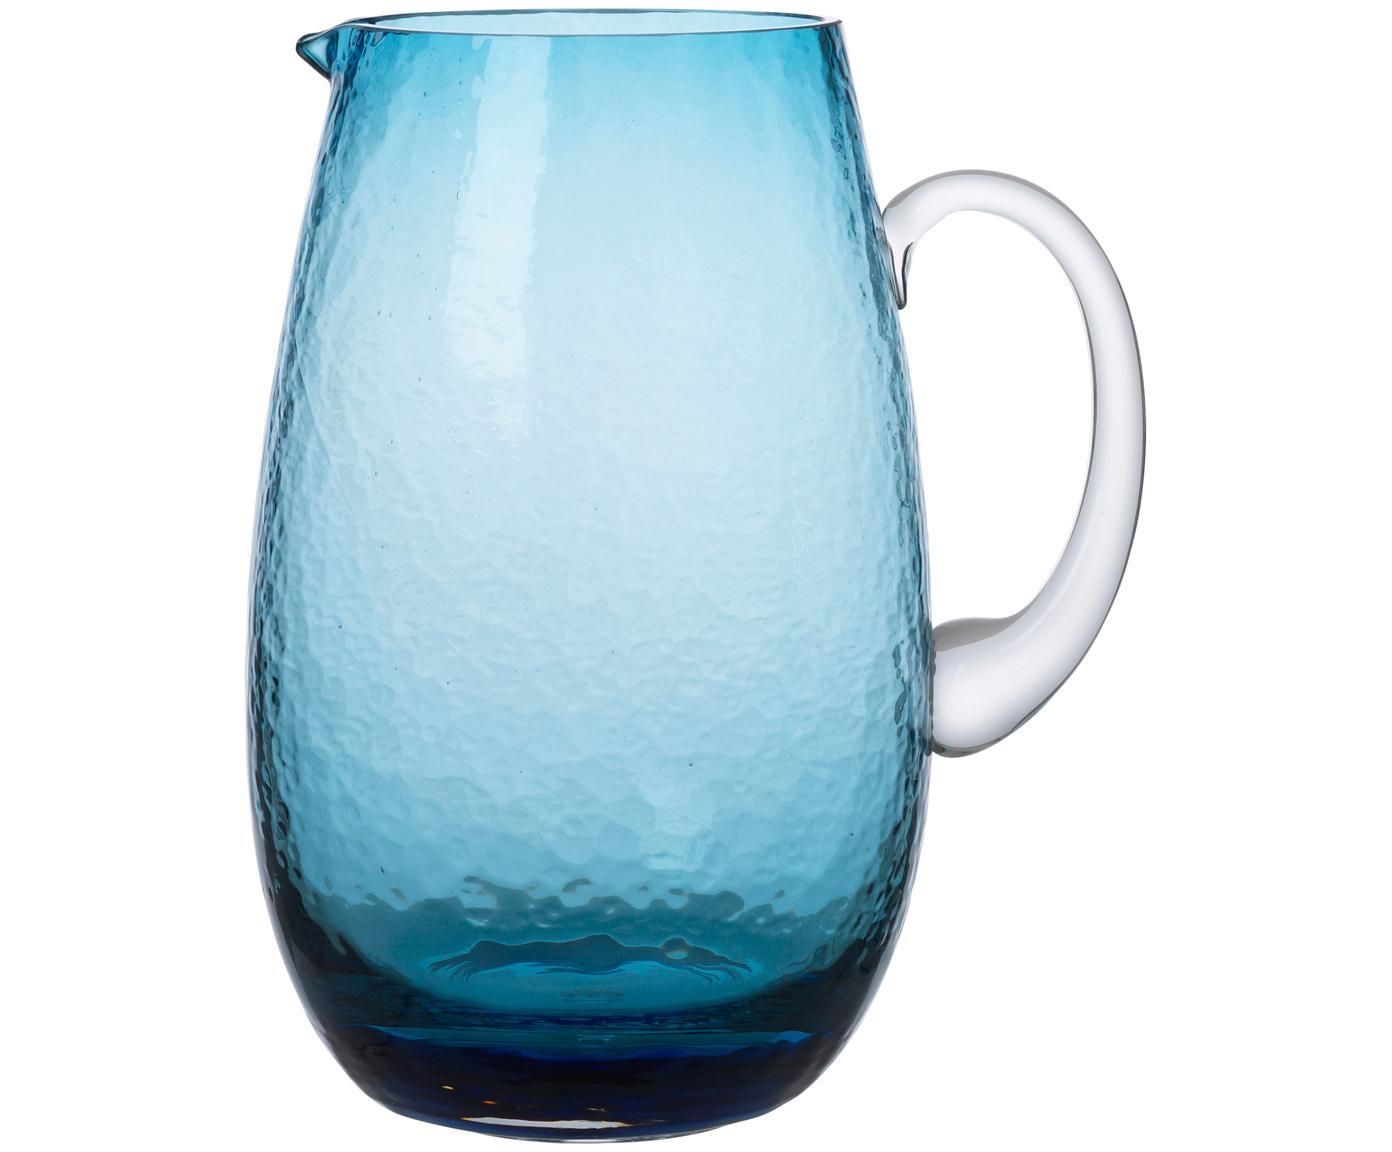 Jarra de vidrio soplado Hammered, Vidrio soplado artesanalmente, Azul, transparente, 2 L